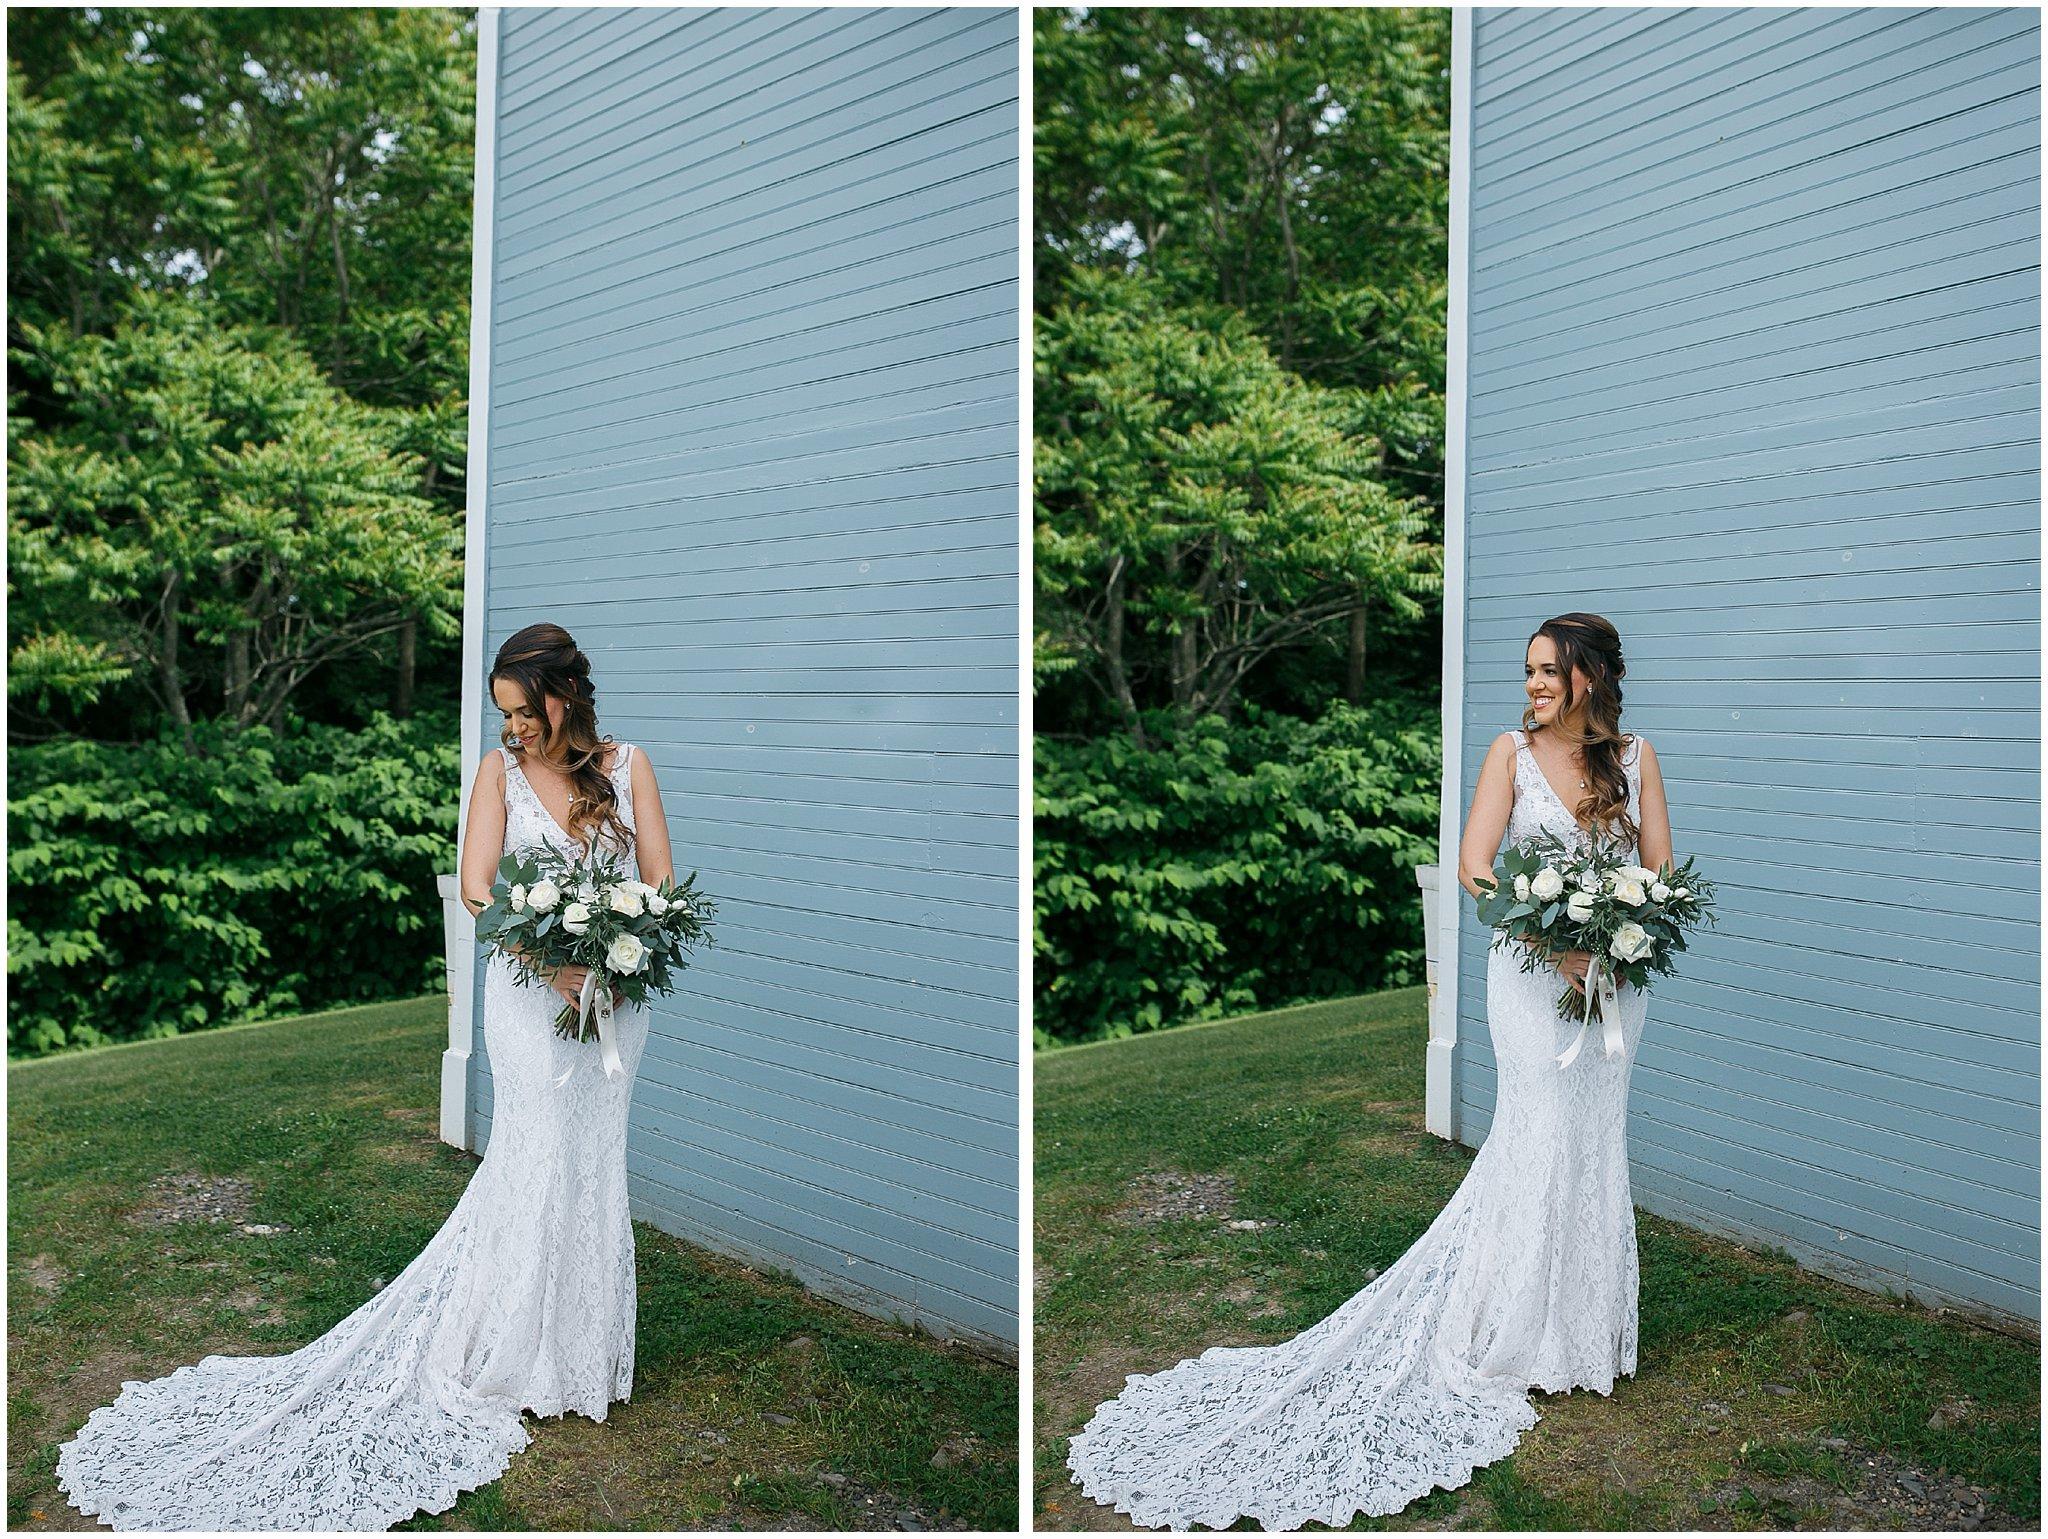 Hudson Valley Weddings at the Hill Hudson New York Wedding Photographer36.jpg